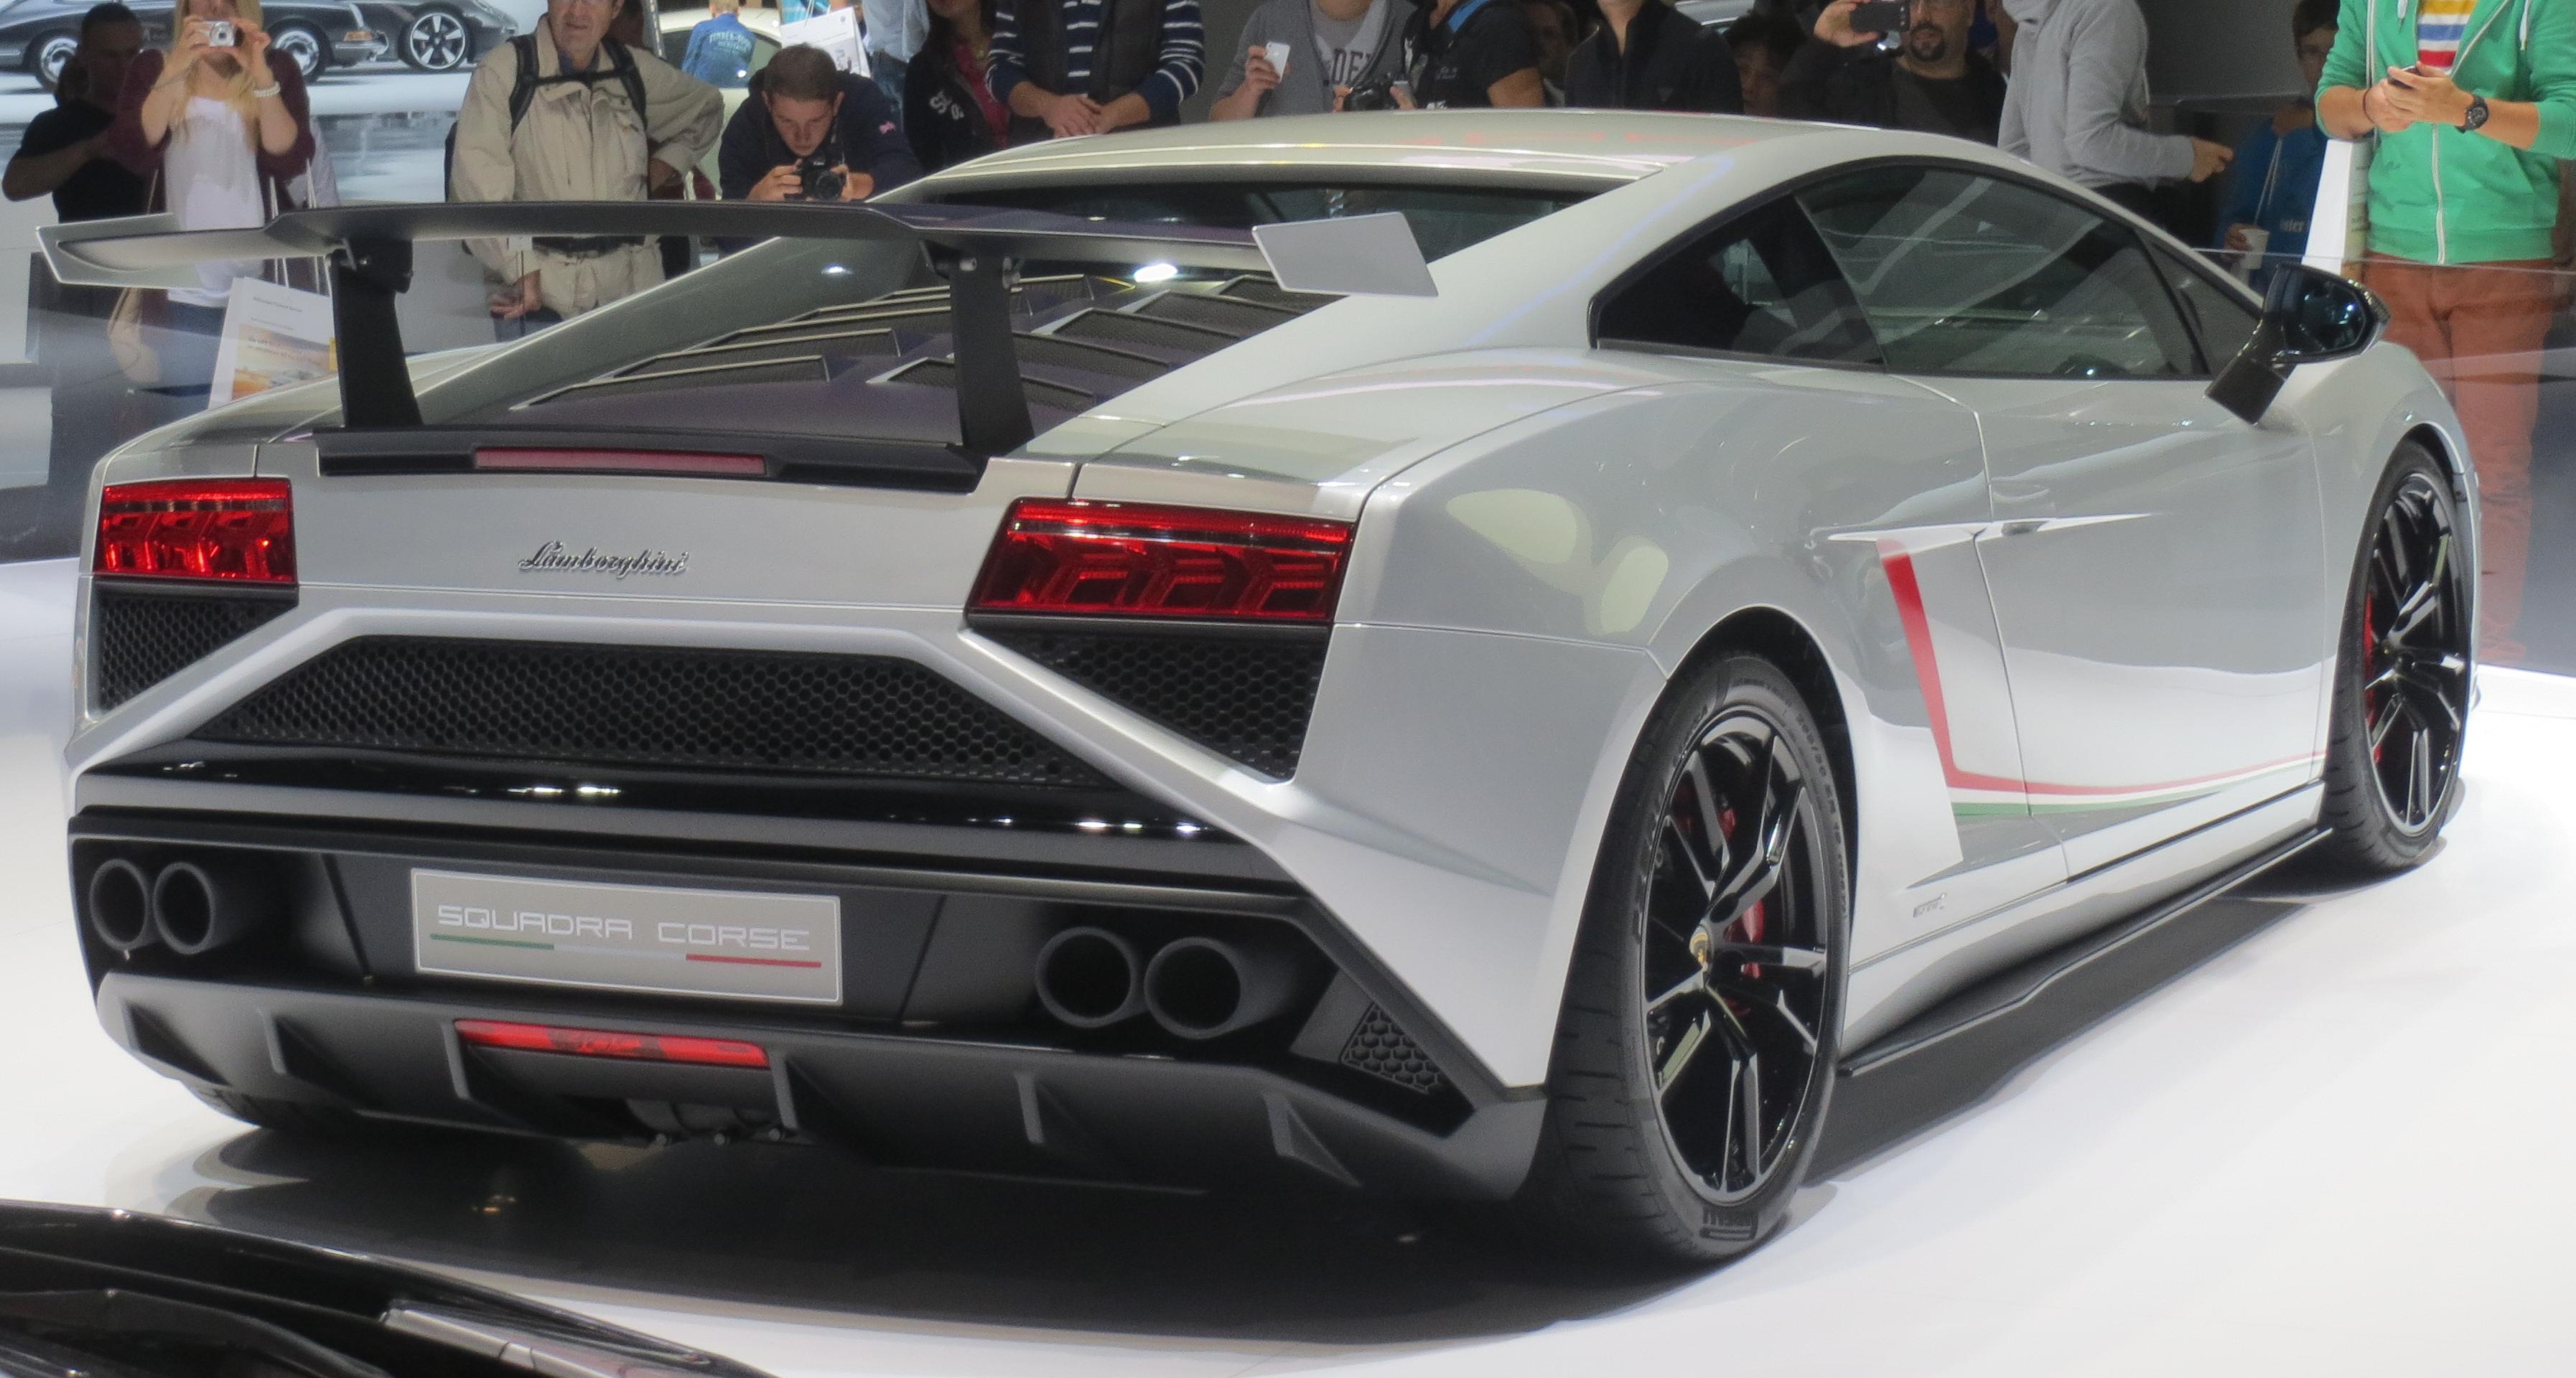 Lamborghini Gallardo - Wikipedia